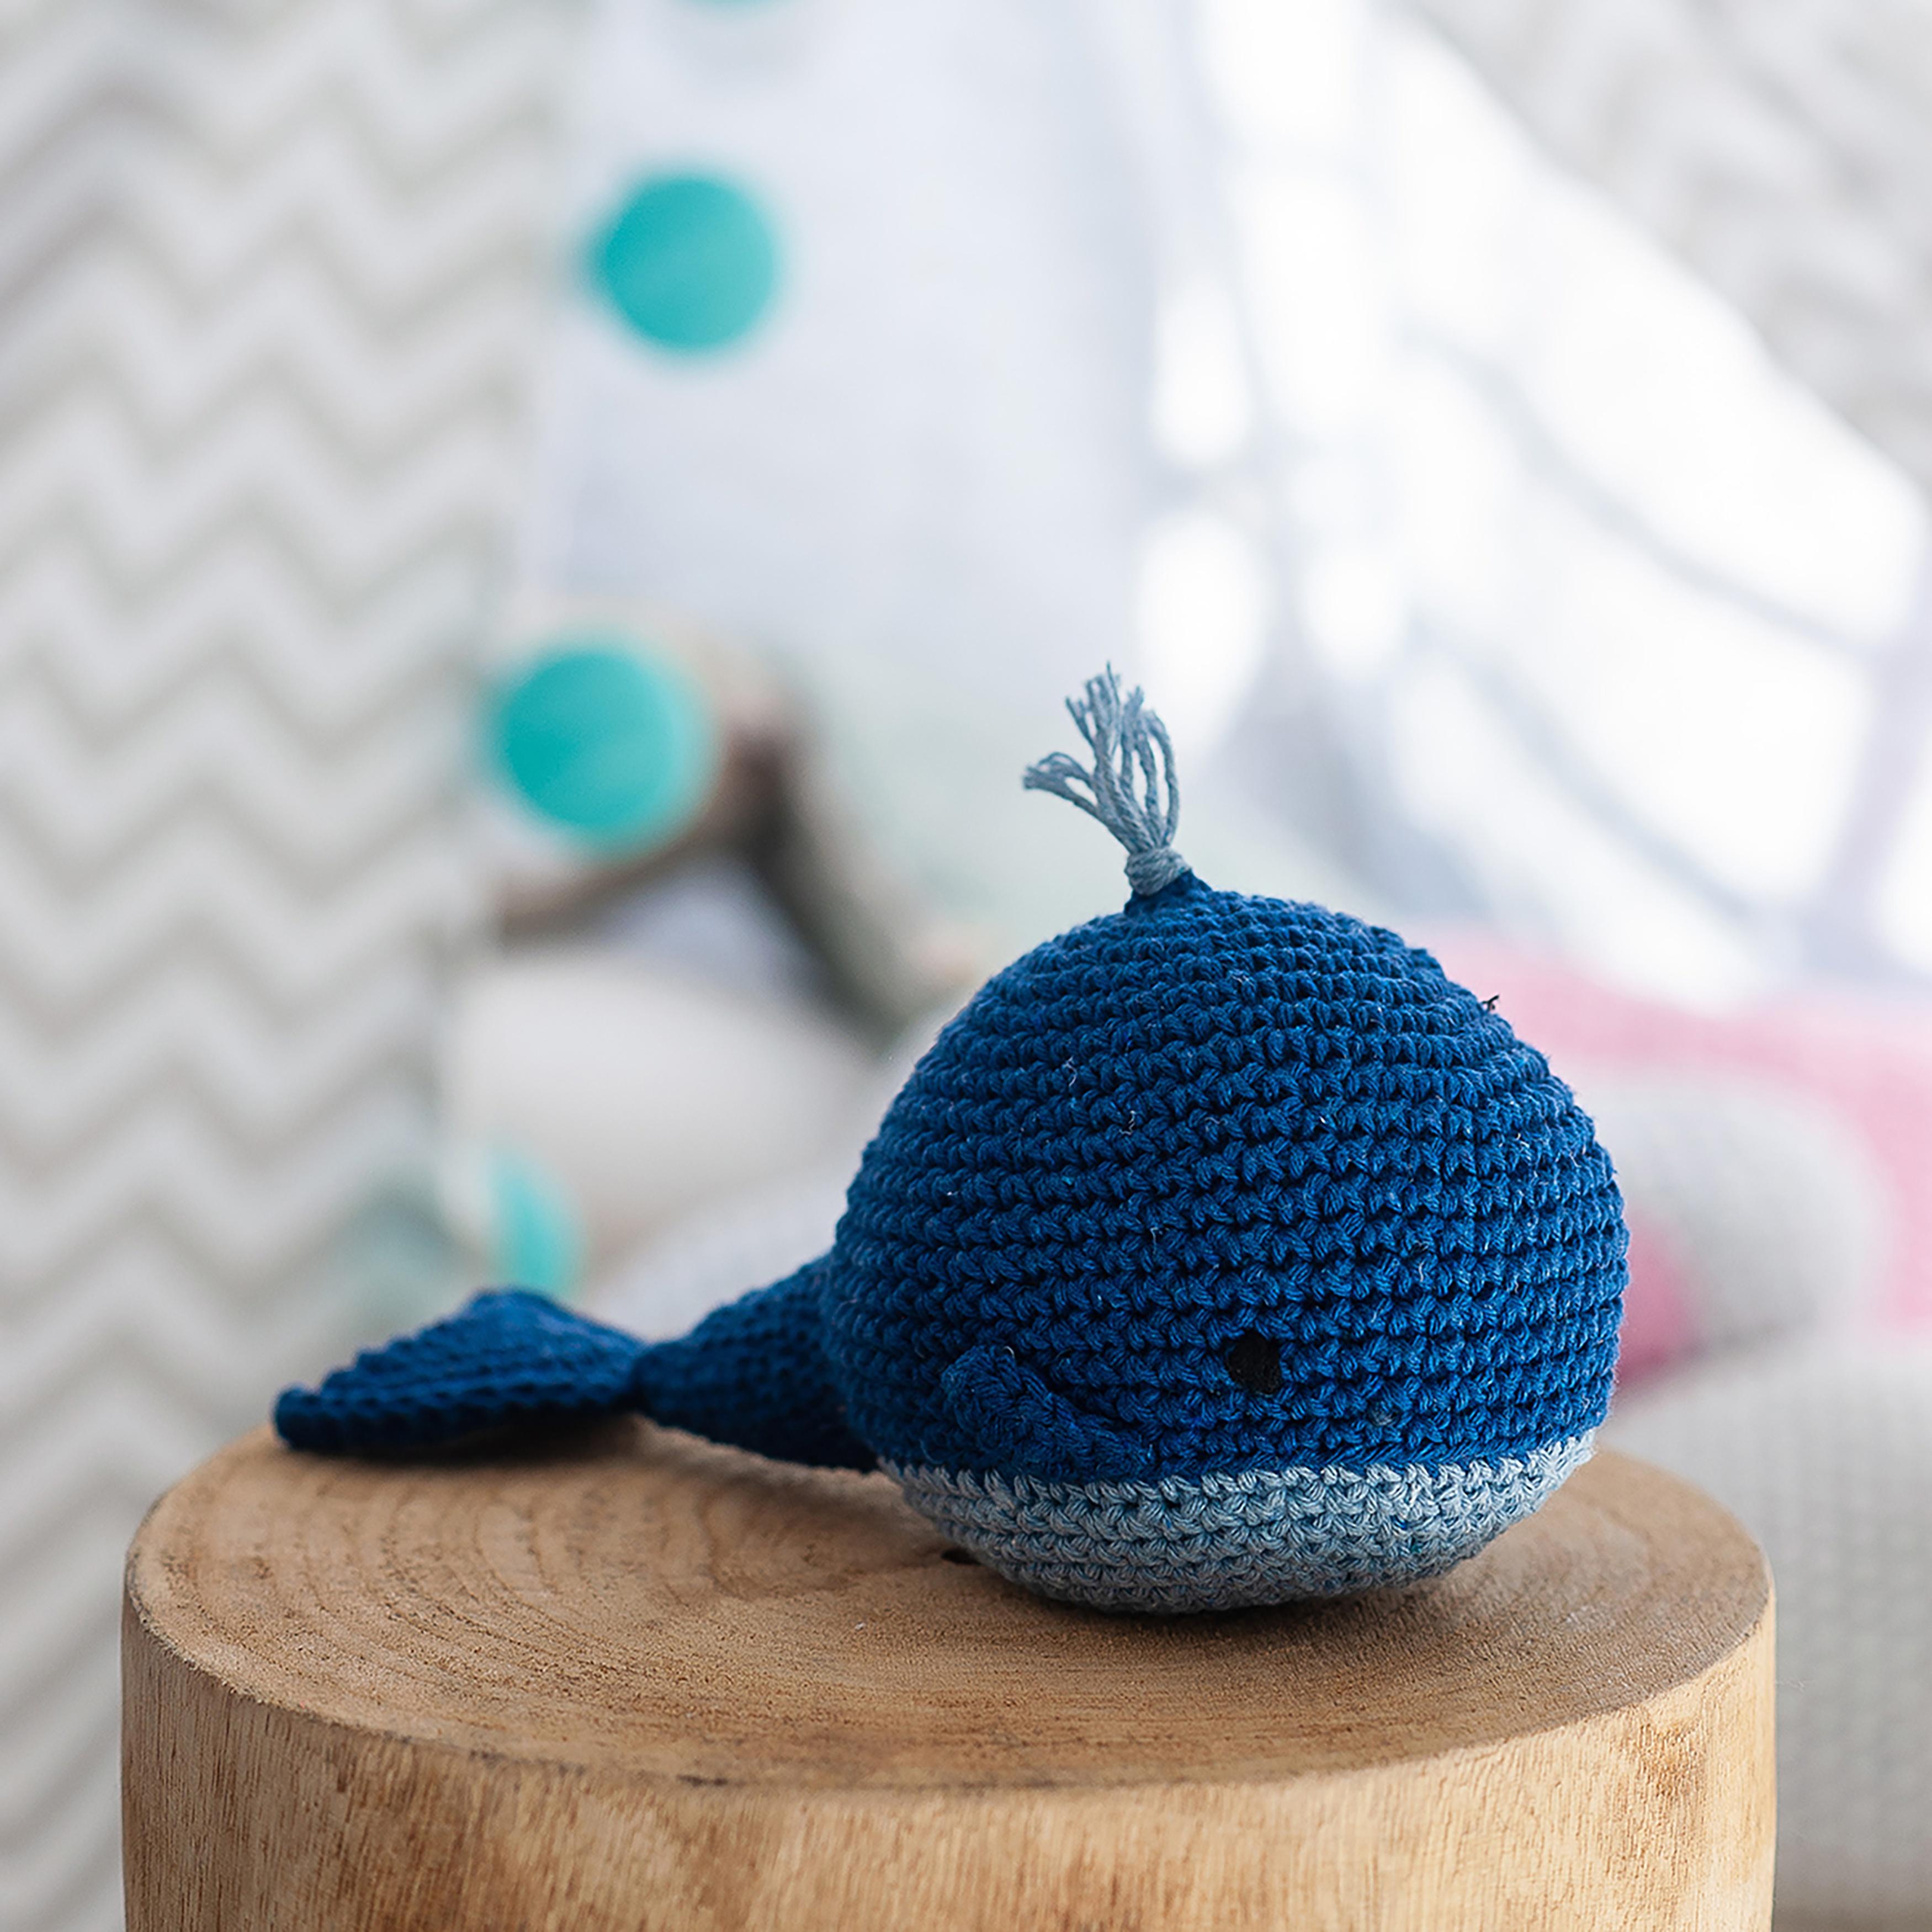 Hoooked Whale Pepper Yarn Kit W/Eco Barbante Yarn